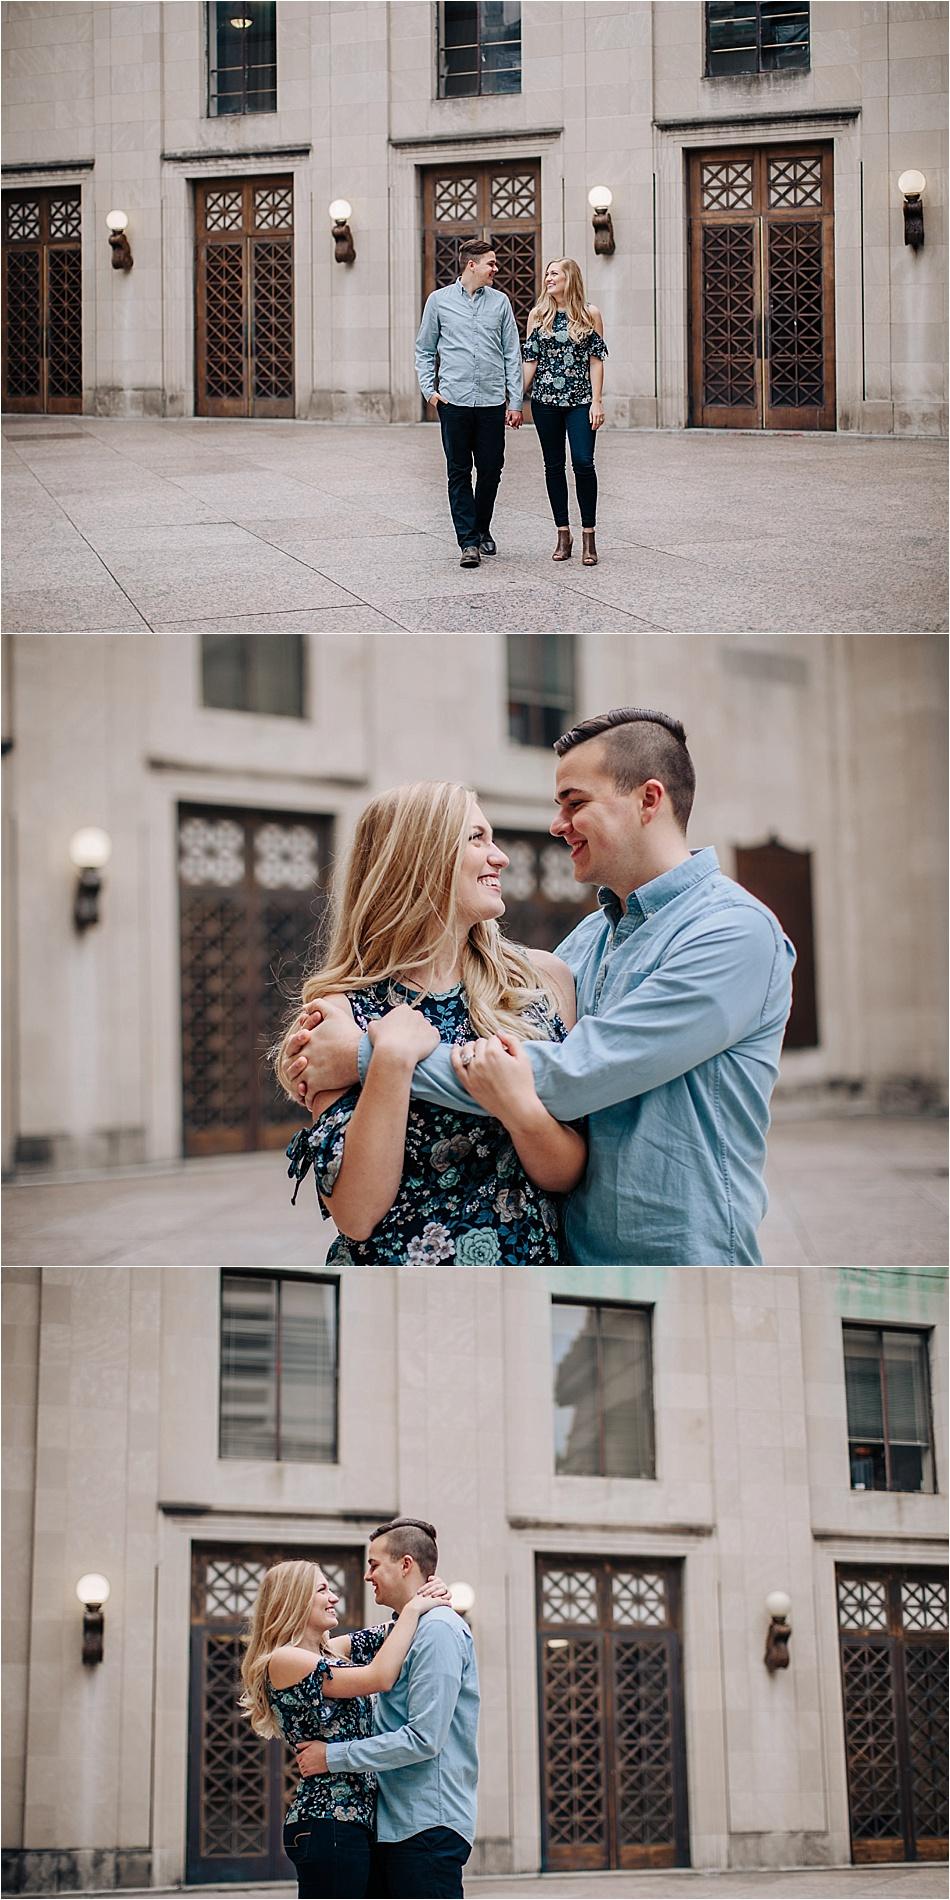 CK-Photo-Nashville-engagement-wedding-photographer-frist-downtown-nashville